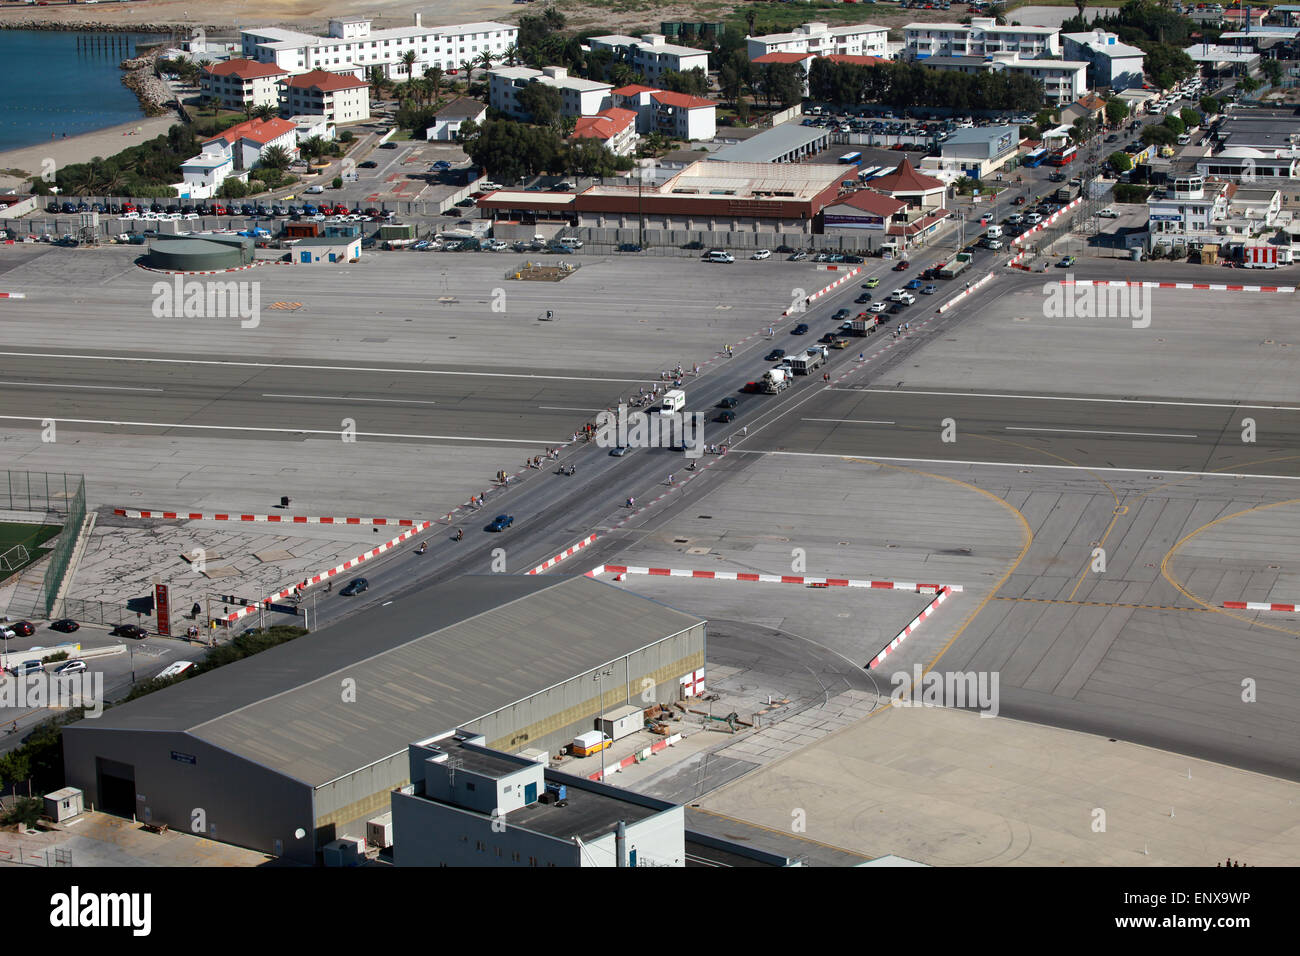 Landebahn des Flughafens Gibraltar - Stock Image